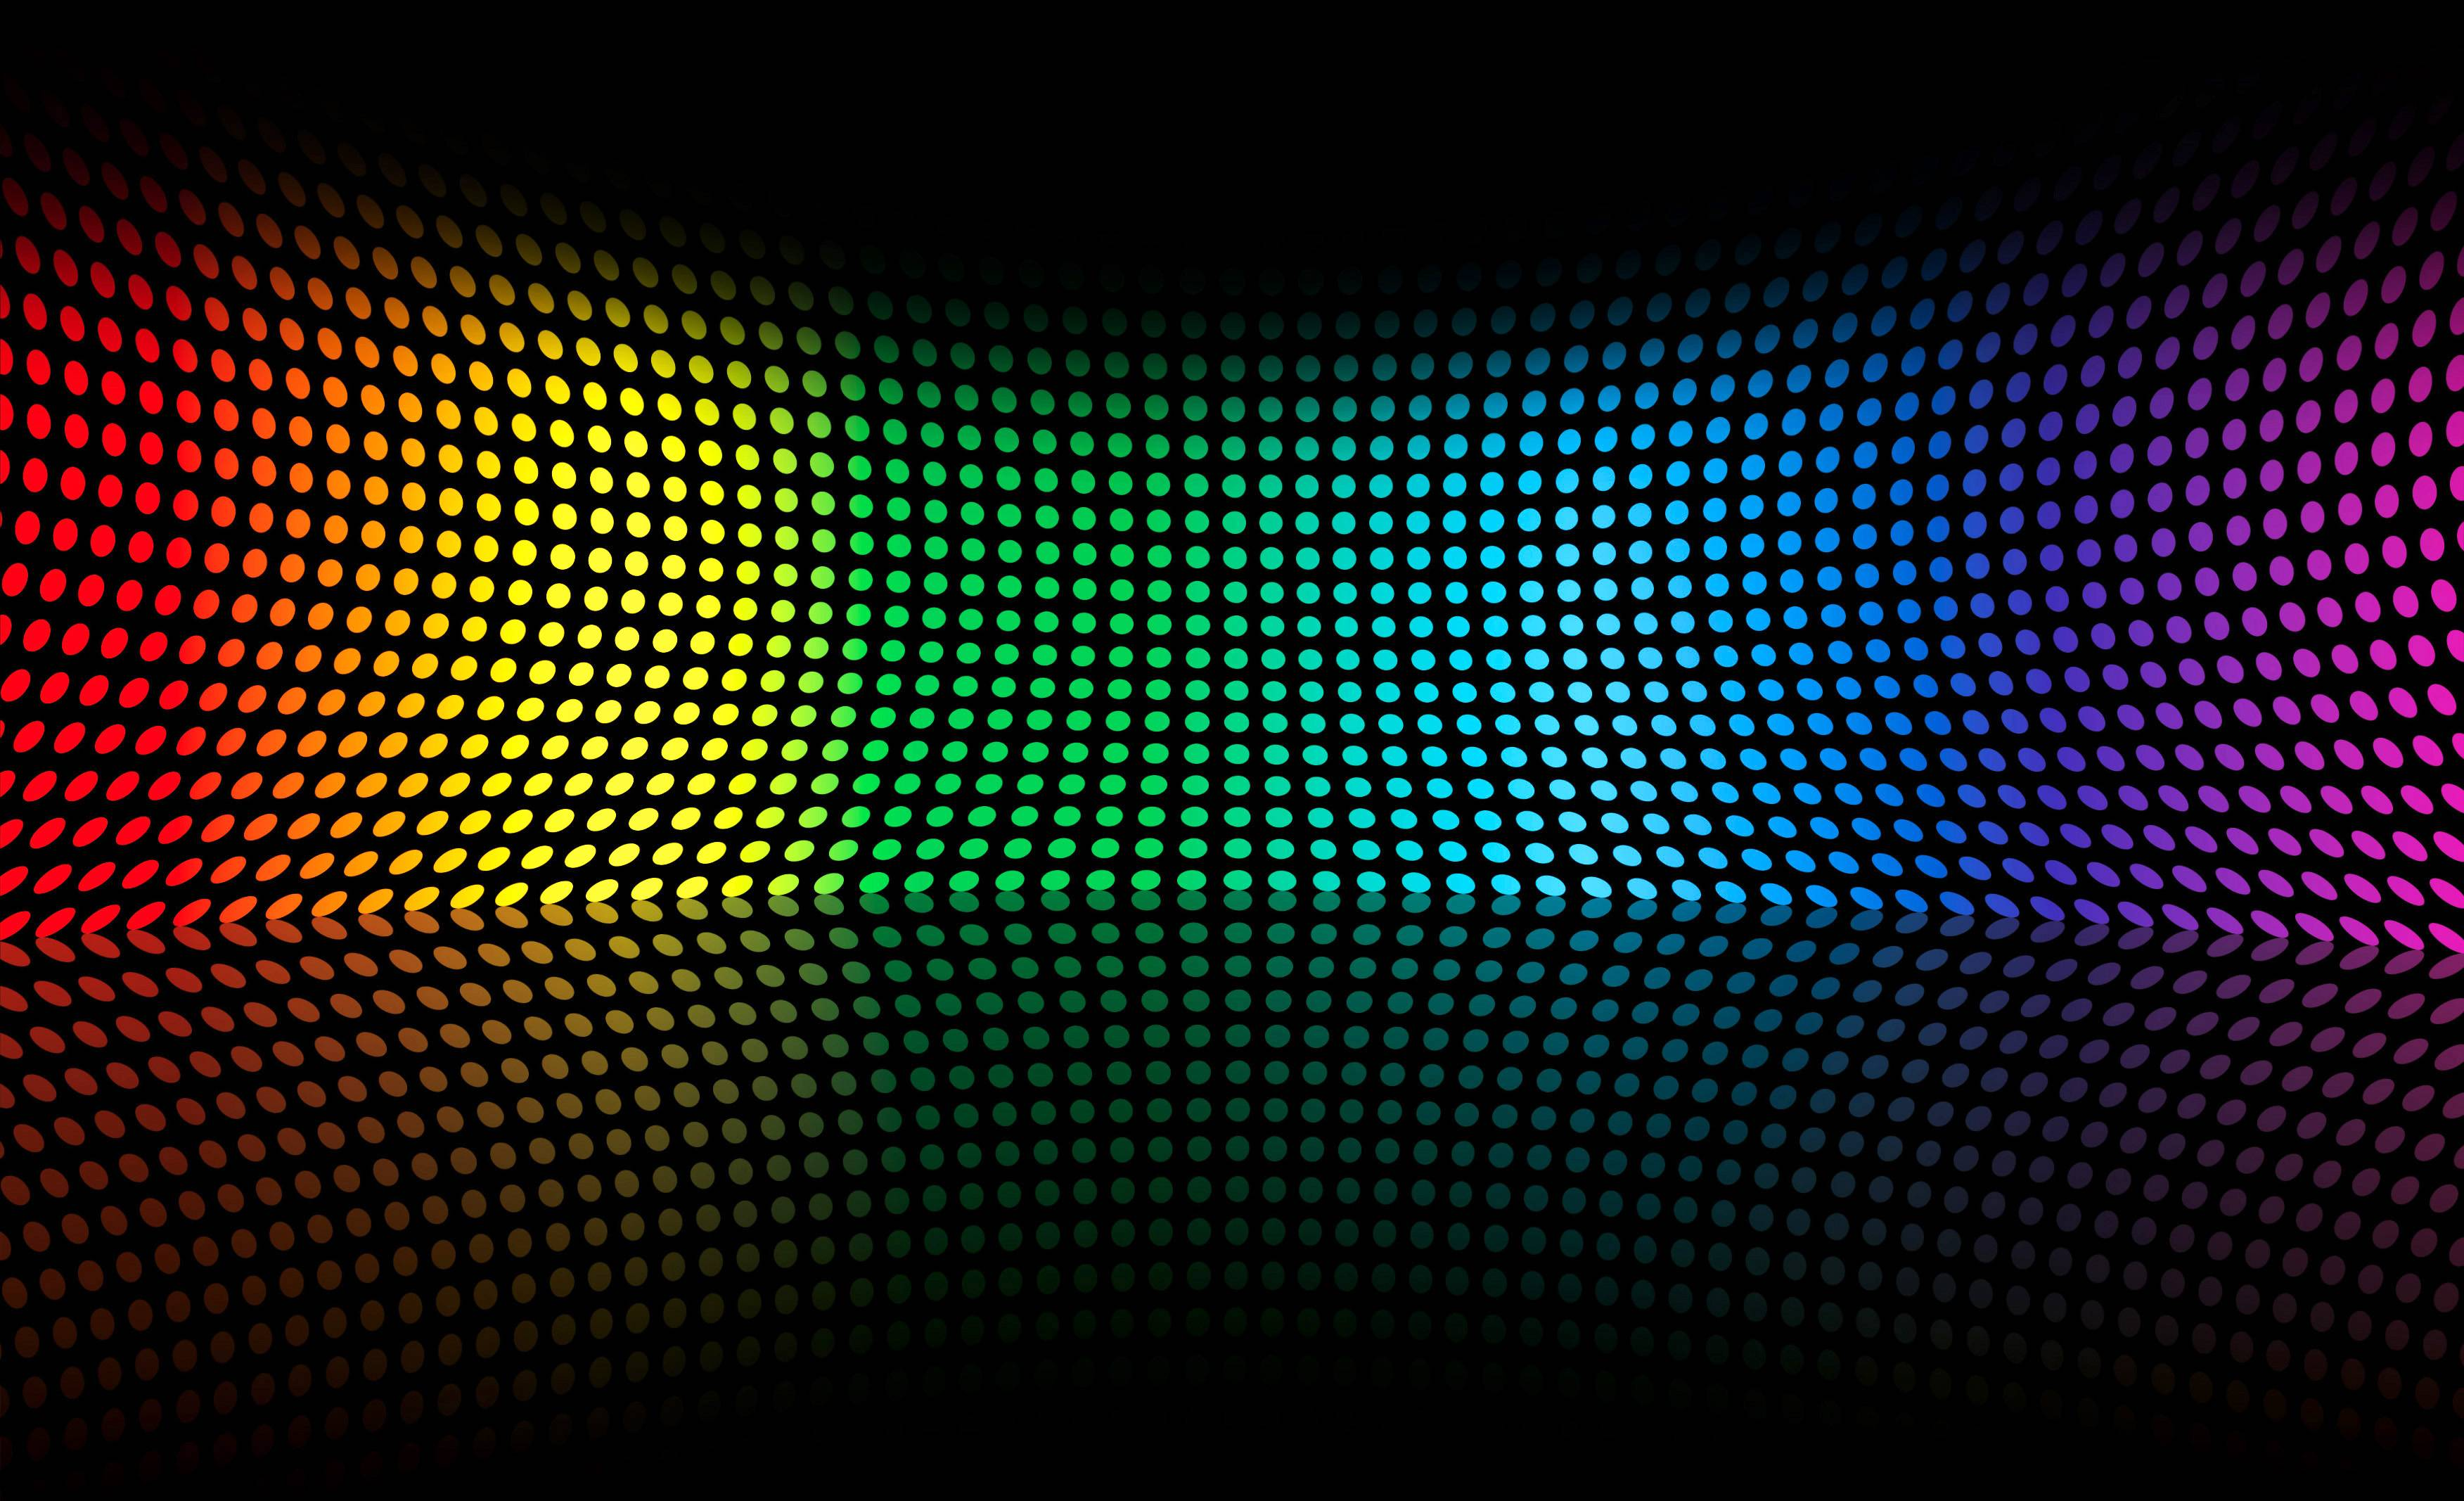 backgrounds high tech - photo #39